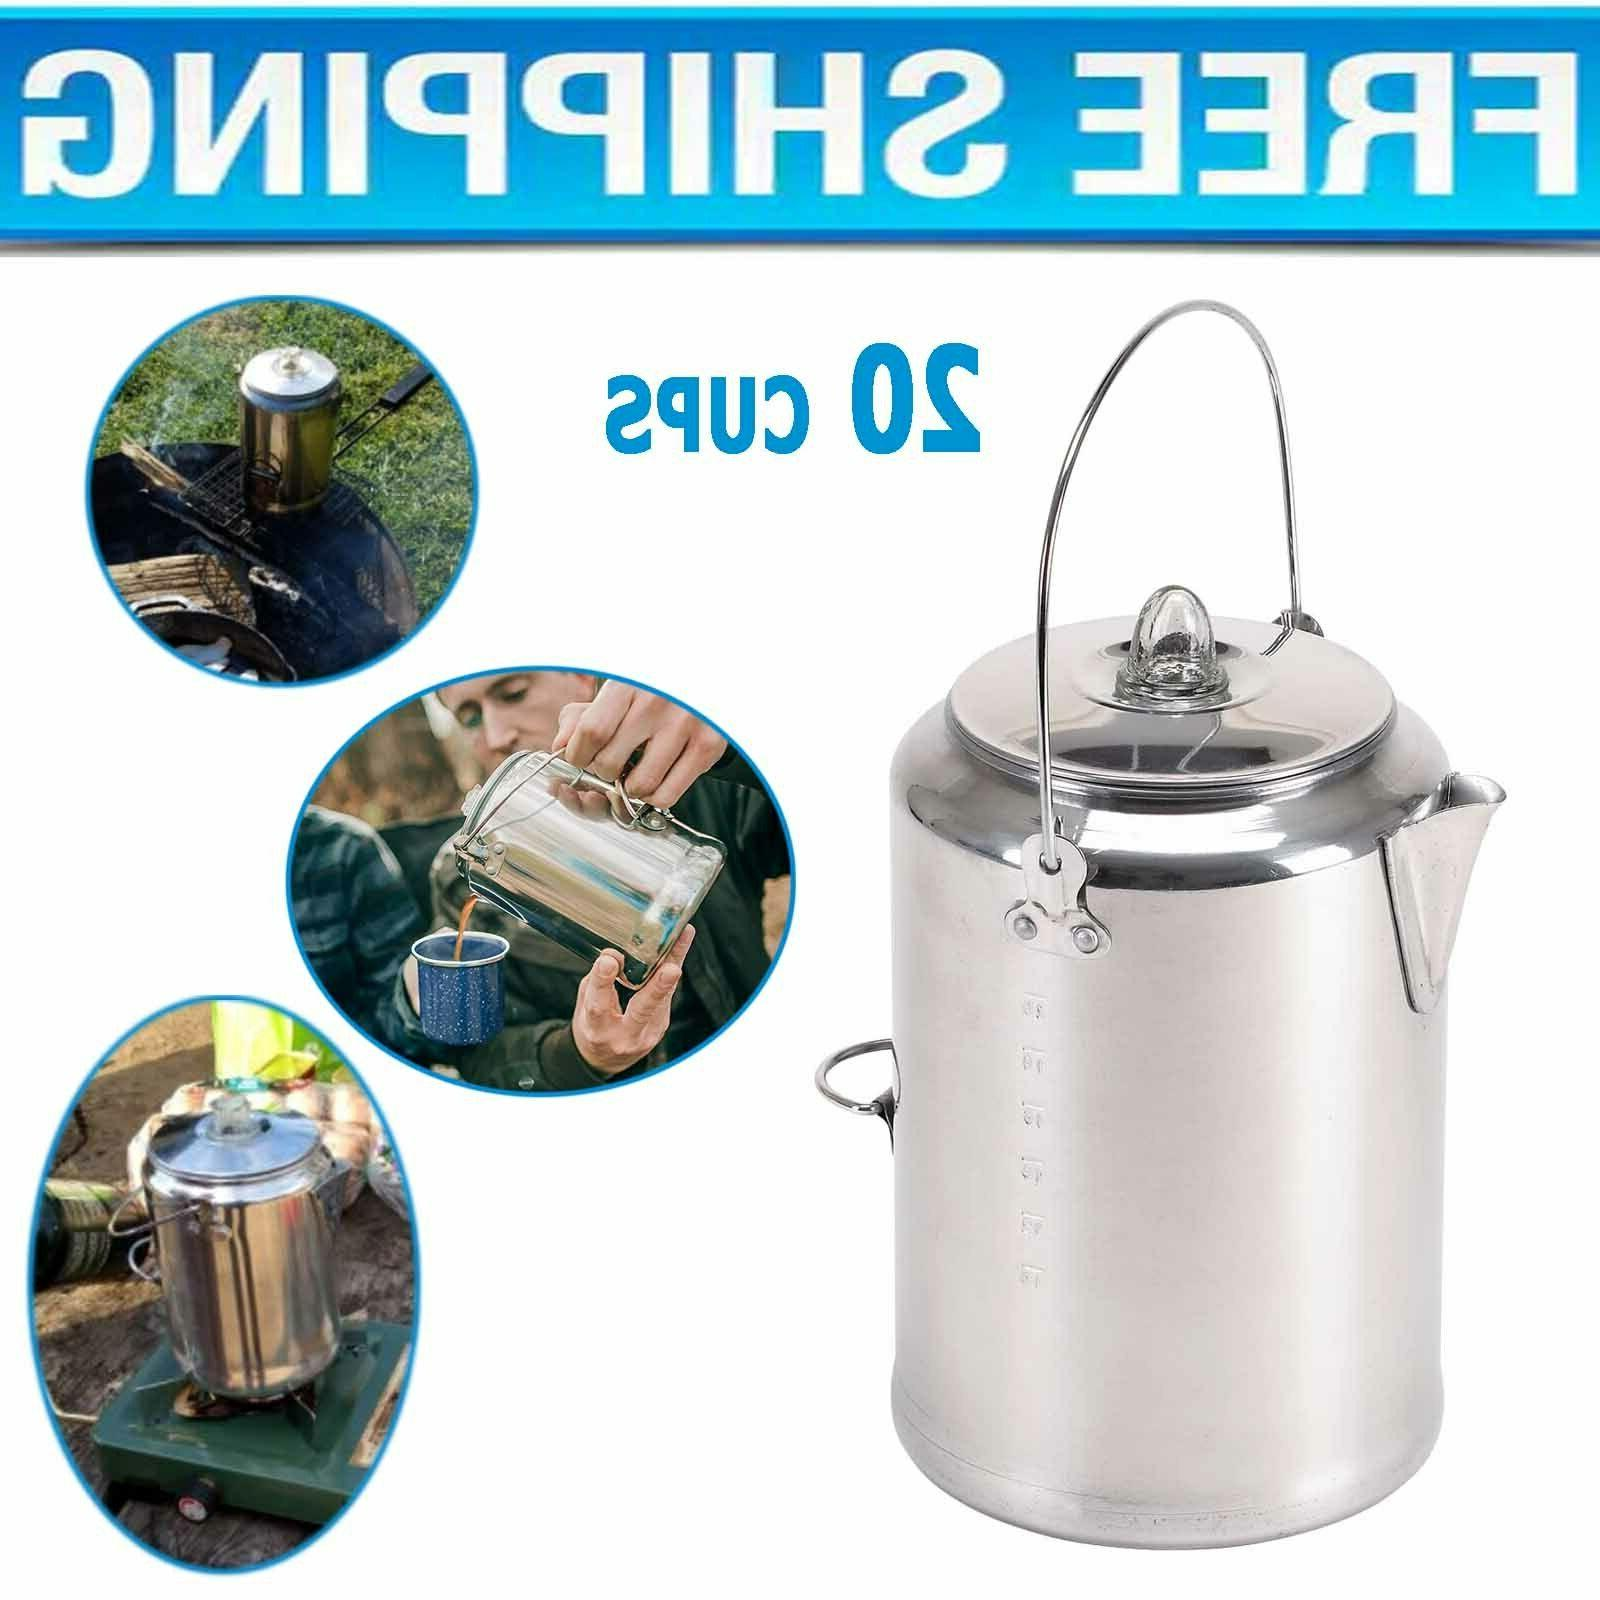 Coffee Pot Camping Percolator Stove Top Outdoor Aluminum Mak